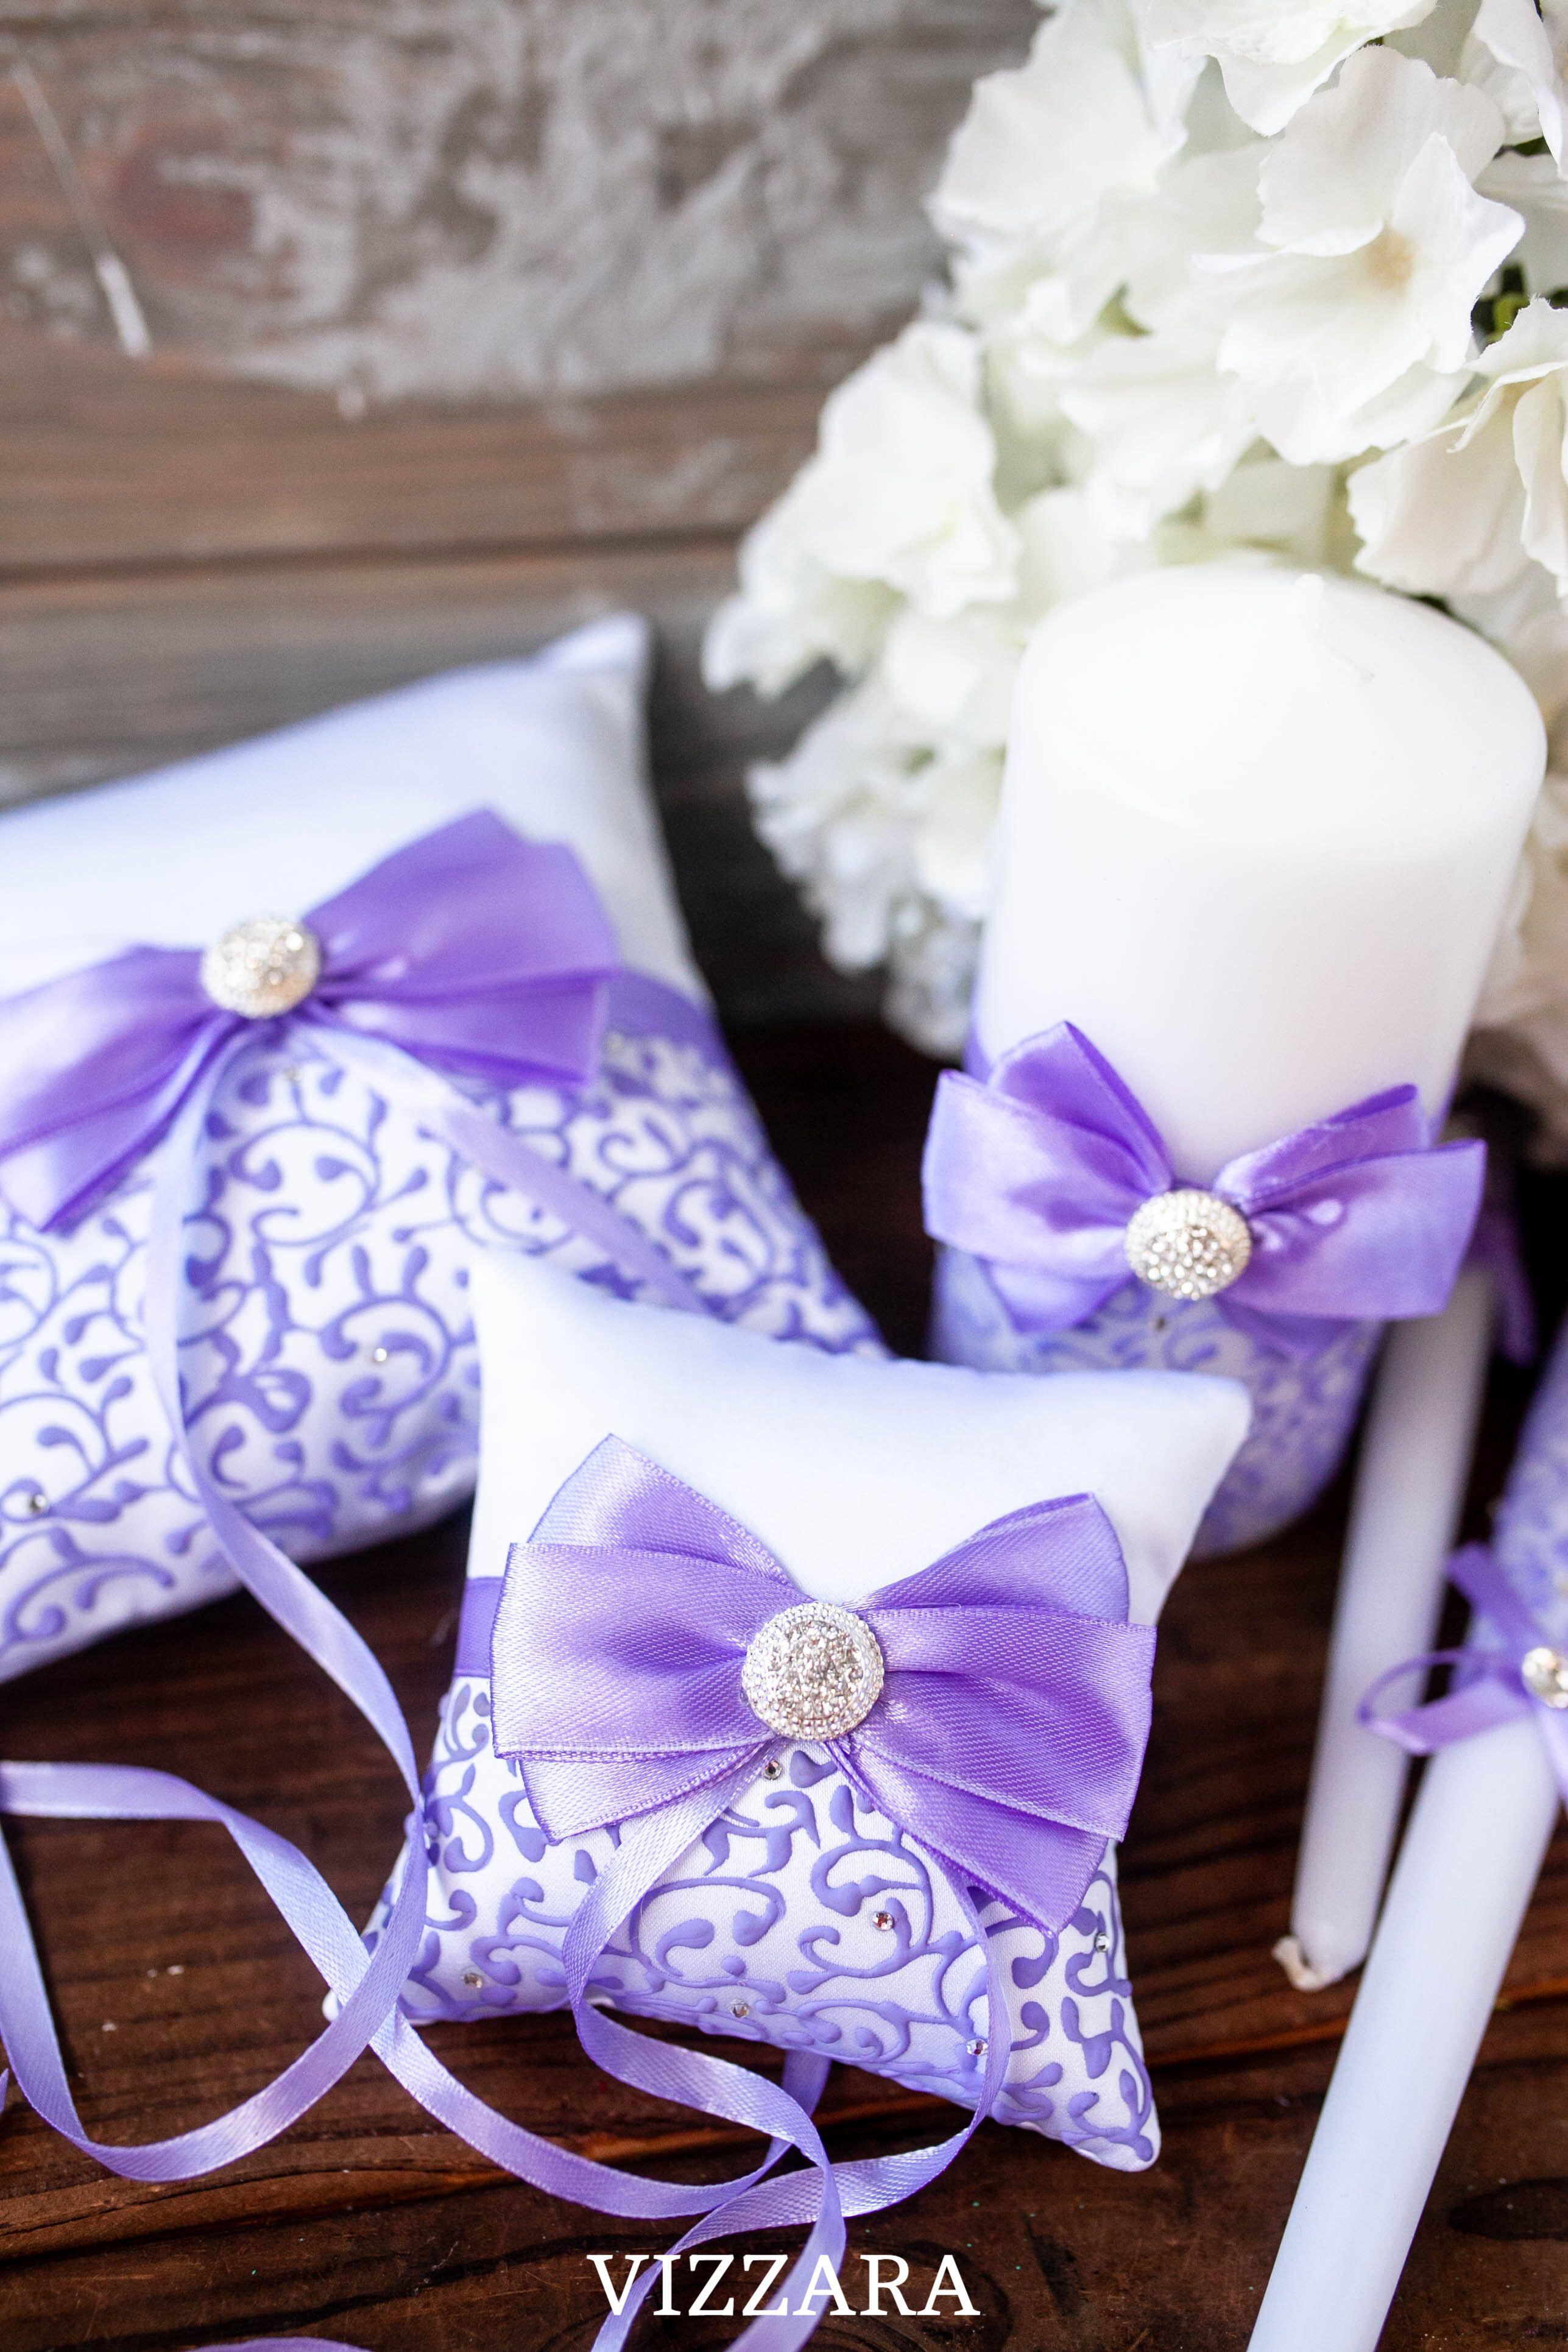 Set Wedding Ideas Collection Wedding Cake Serving Set Cutter Etsy In 2020 Wedding Champagne Flutes Card Box Wedding White Wedding Ring